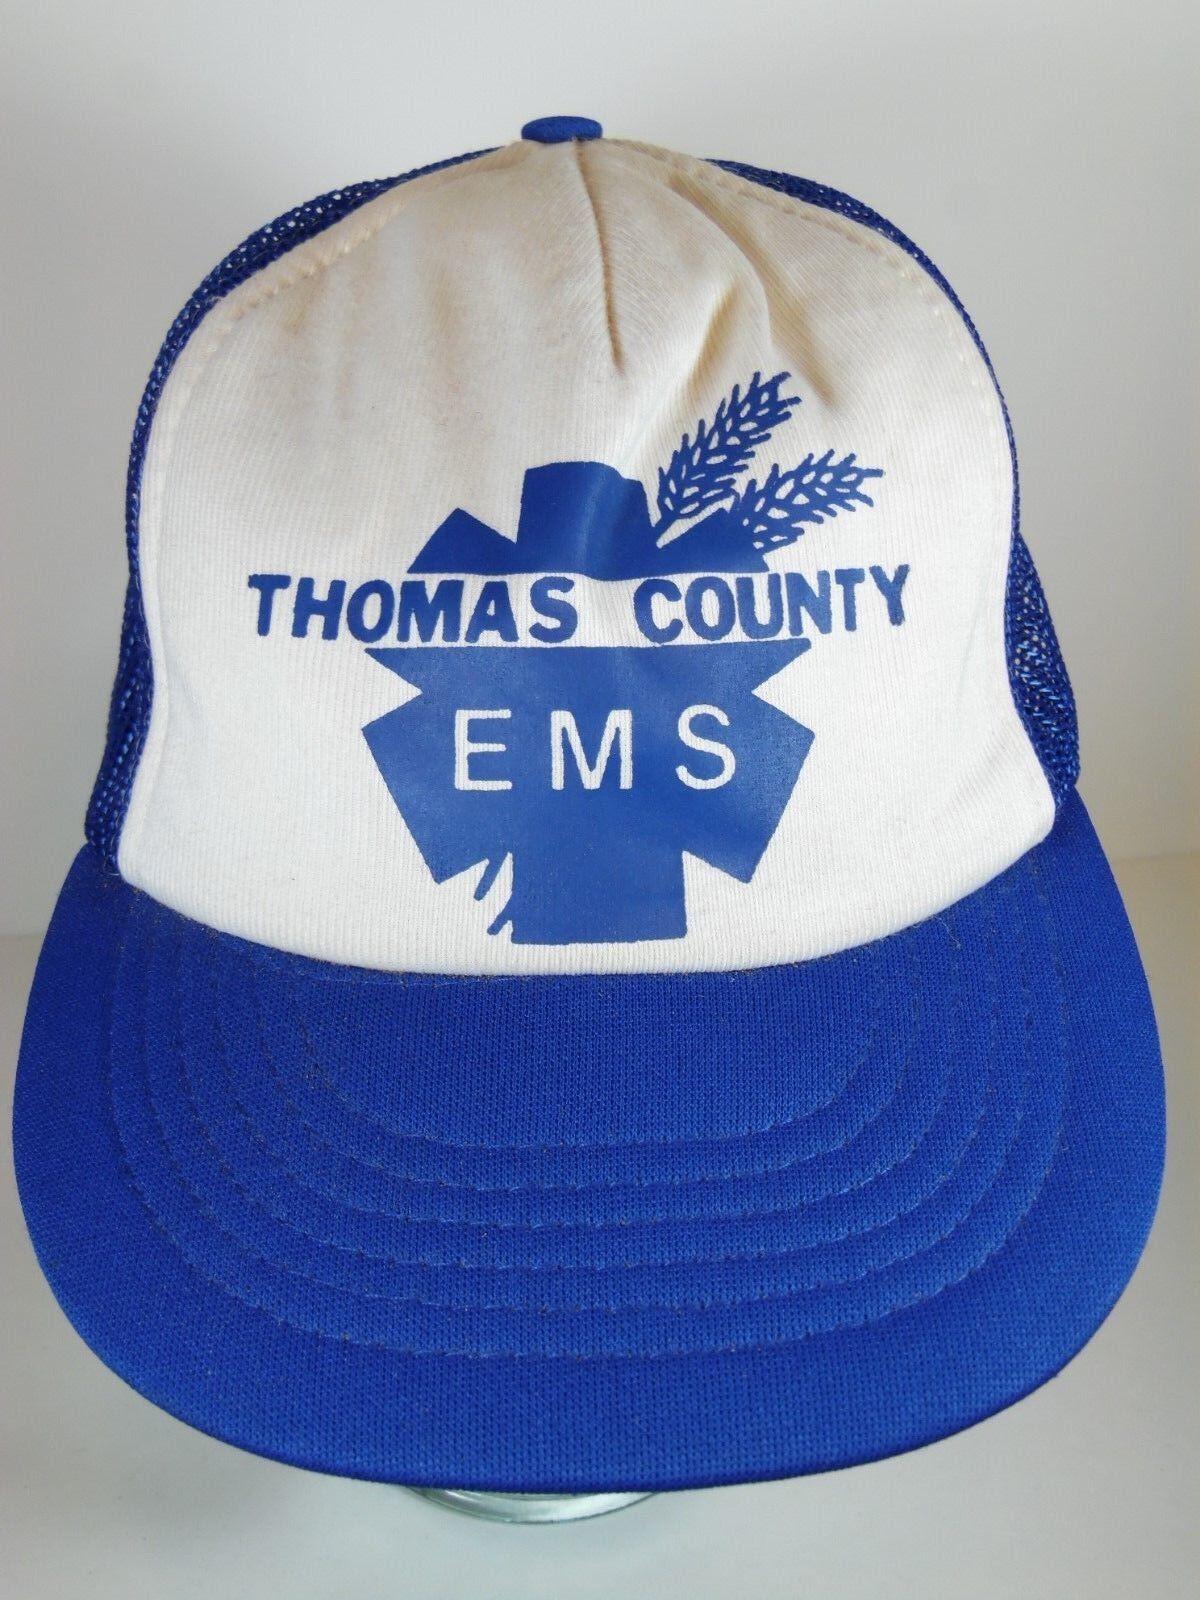 Vintage 1980s THOMAS COUNTY EMS Ambulance Advertising SNAPBACK HAT TRUCKER CAP